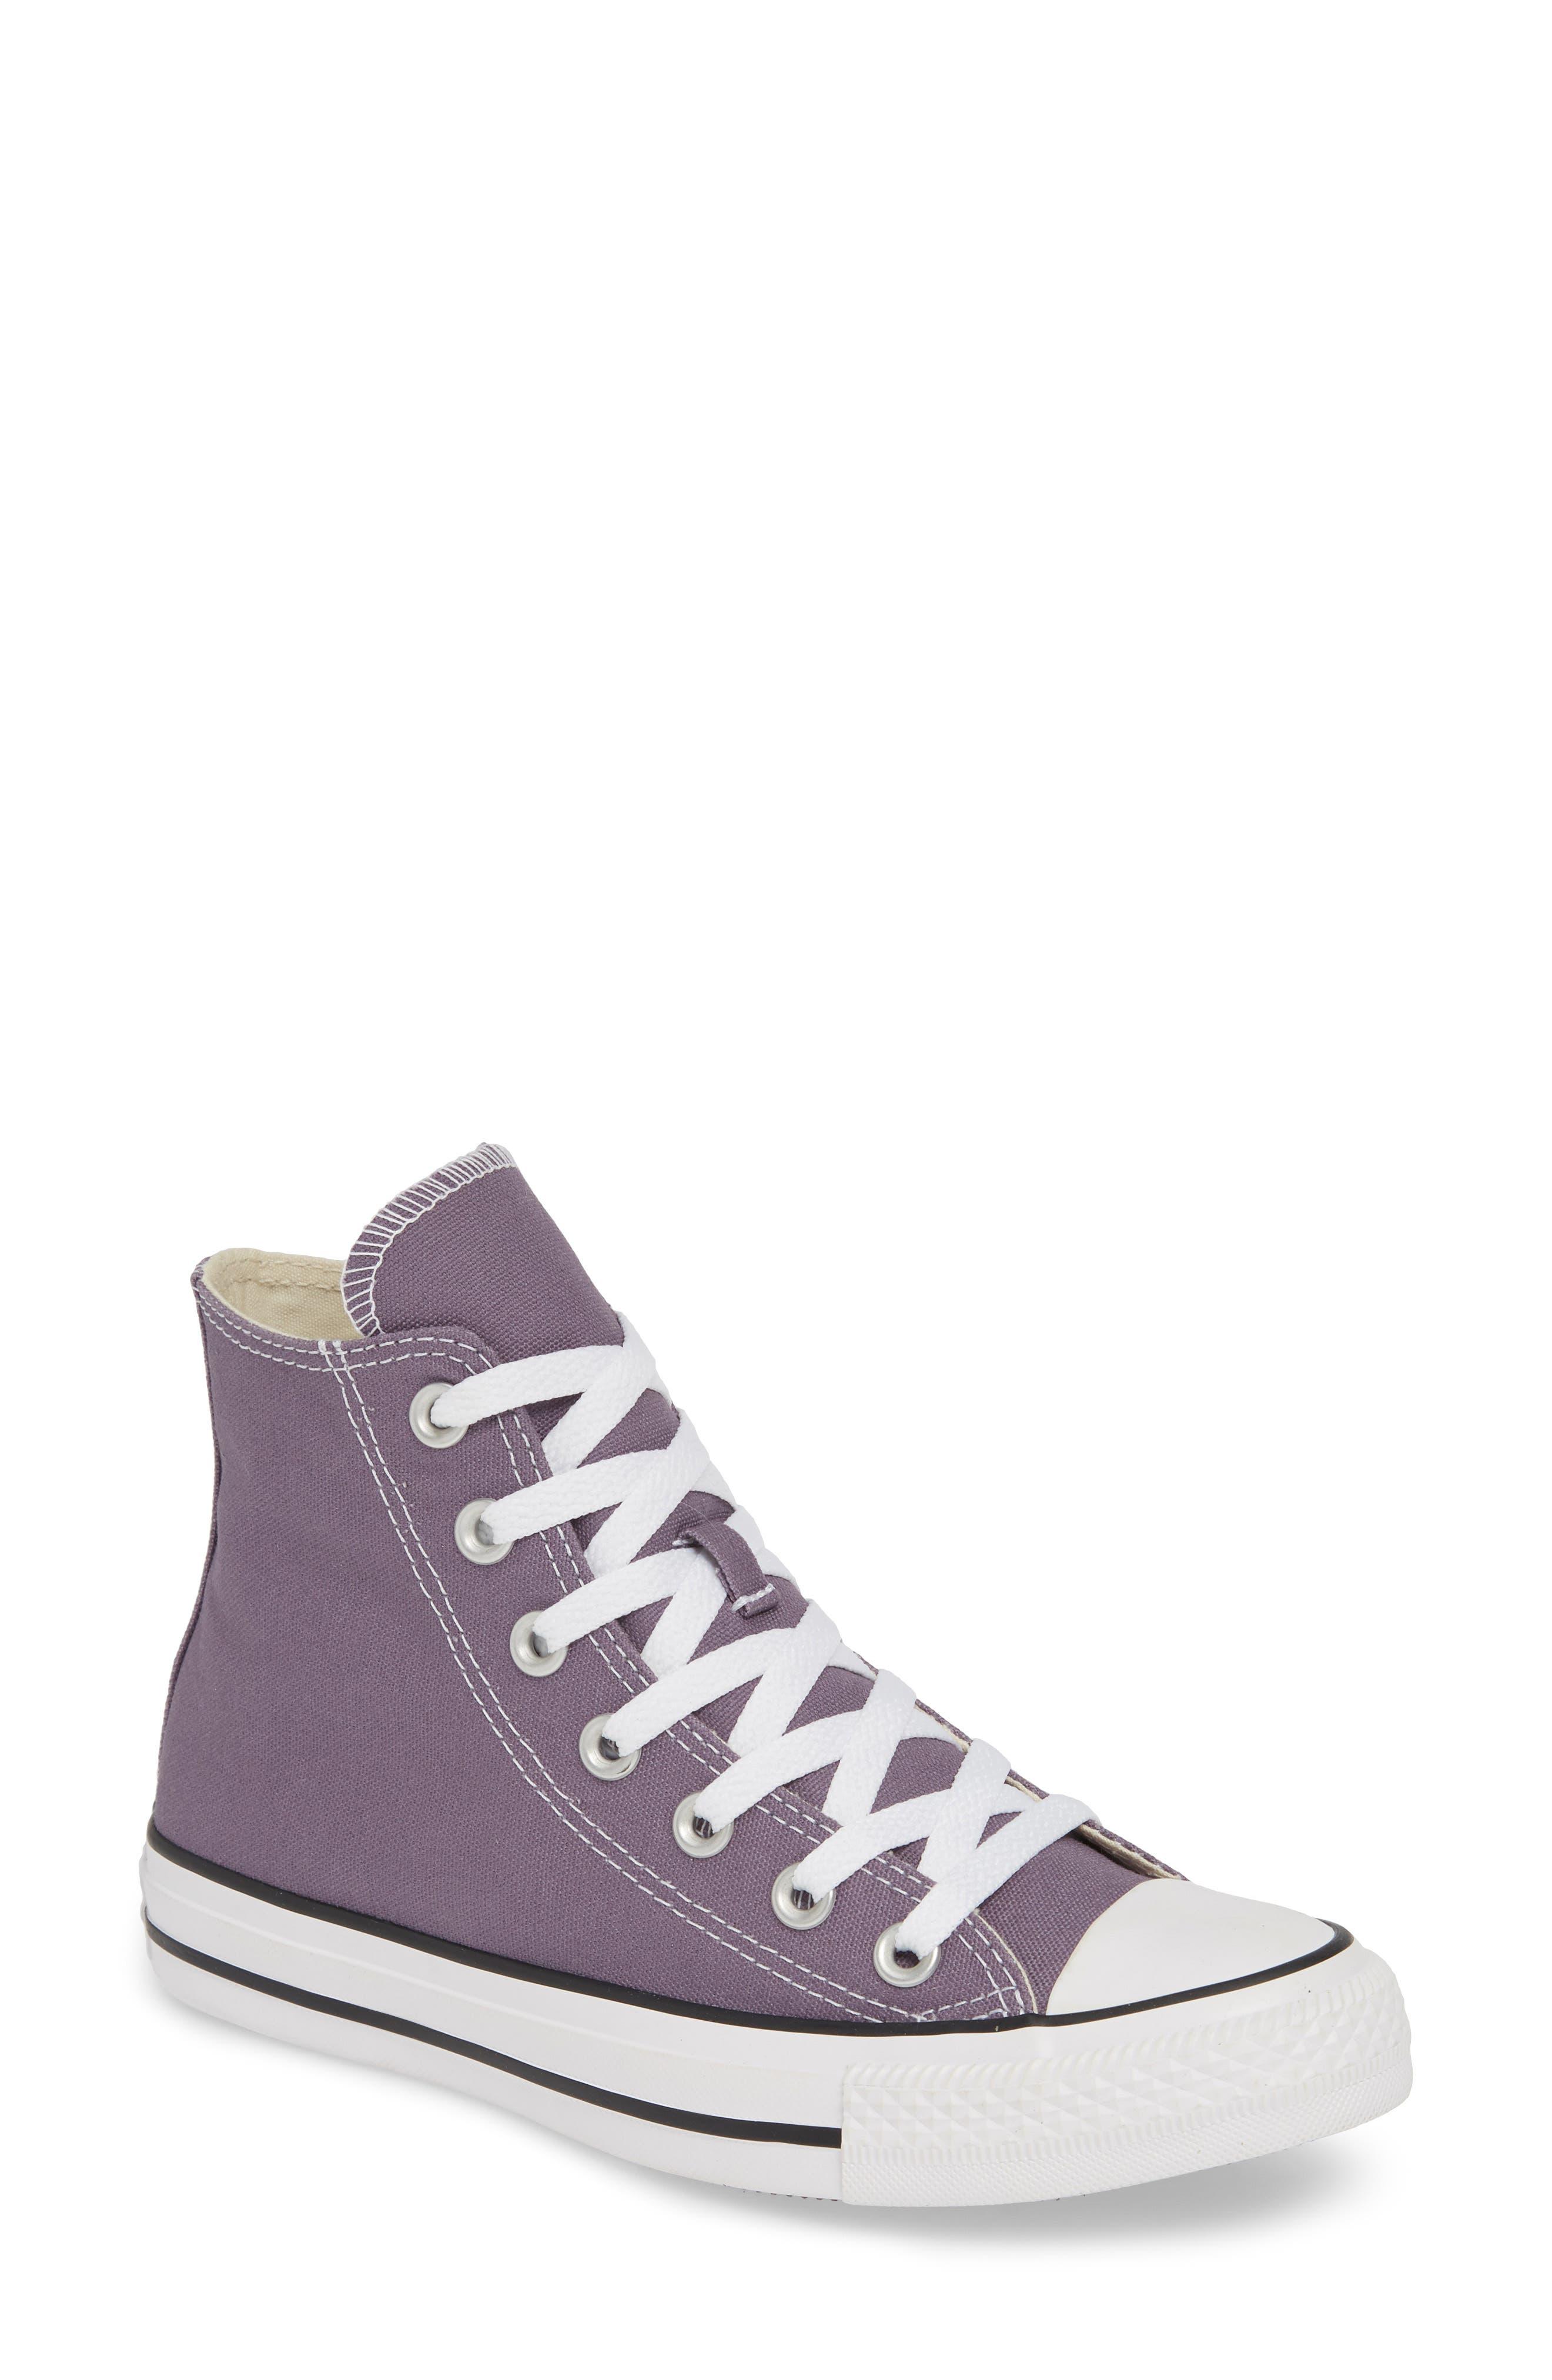 Converse Chuck Taylor All Star High Top Sneaker 8f34739fc